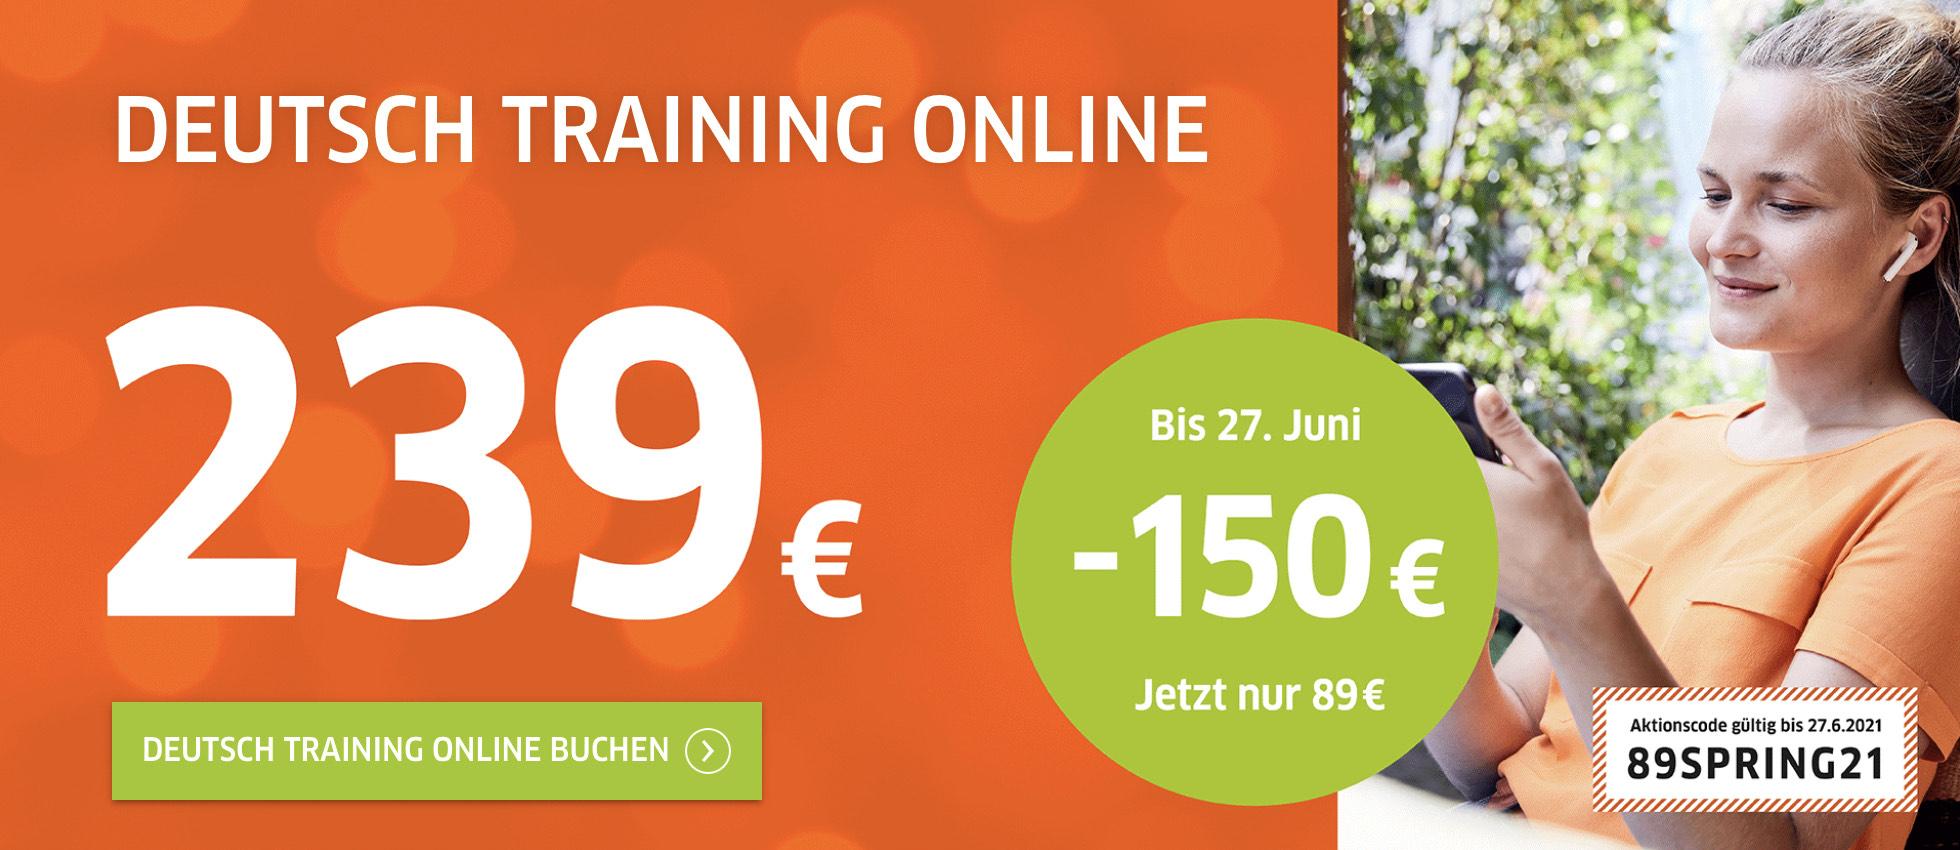 Goethe Institut Deutsch Training Online